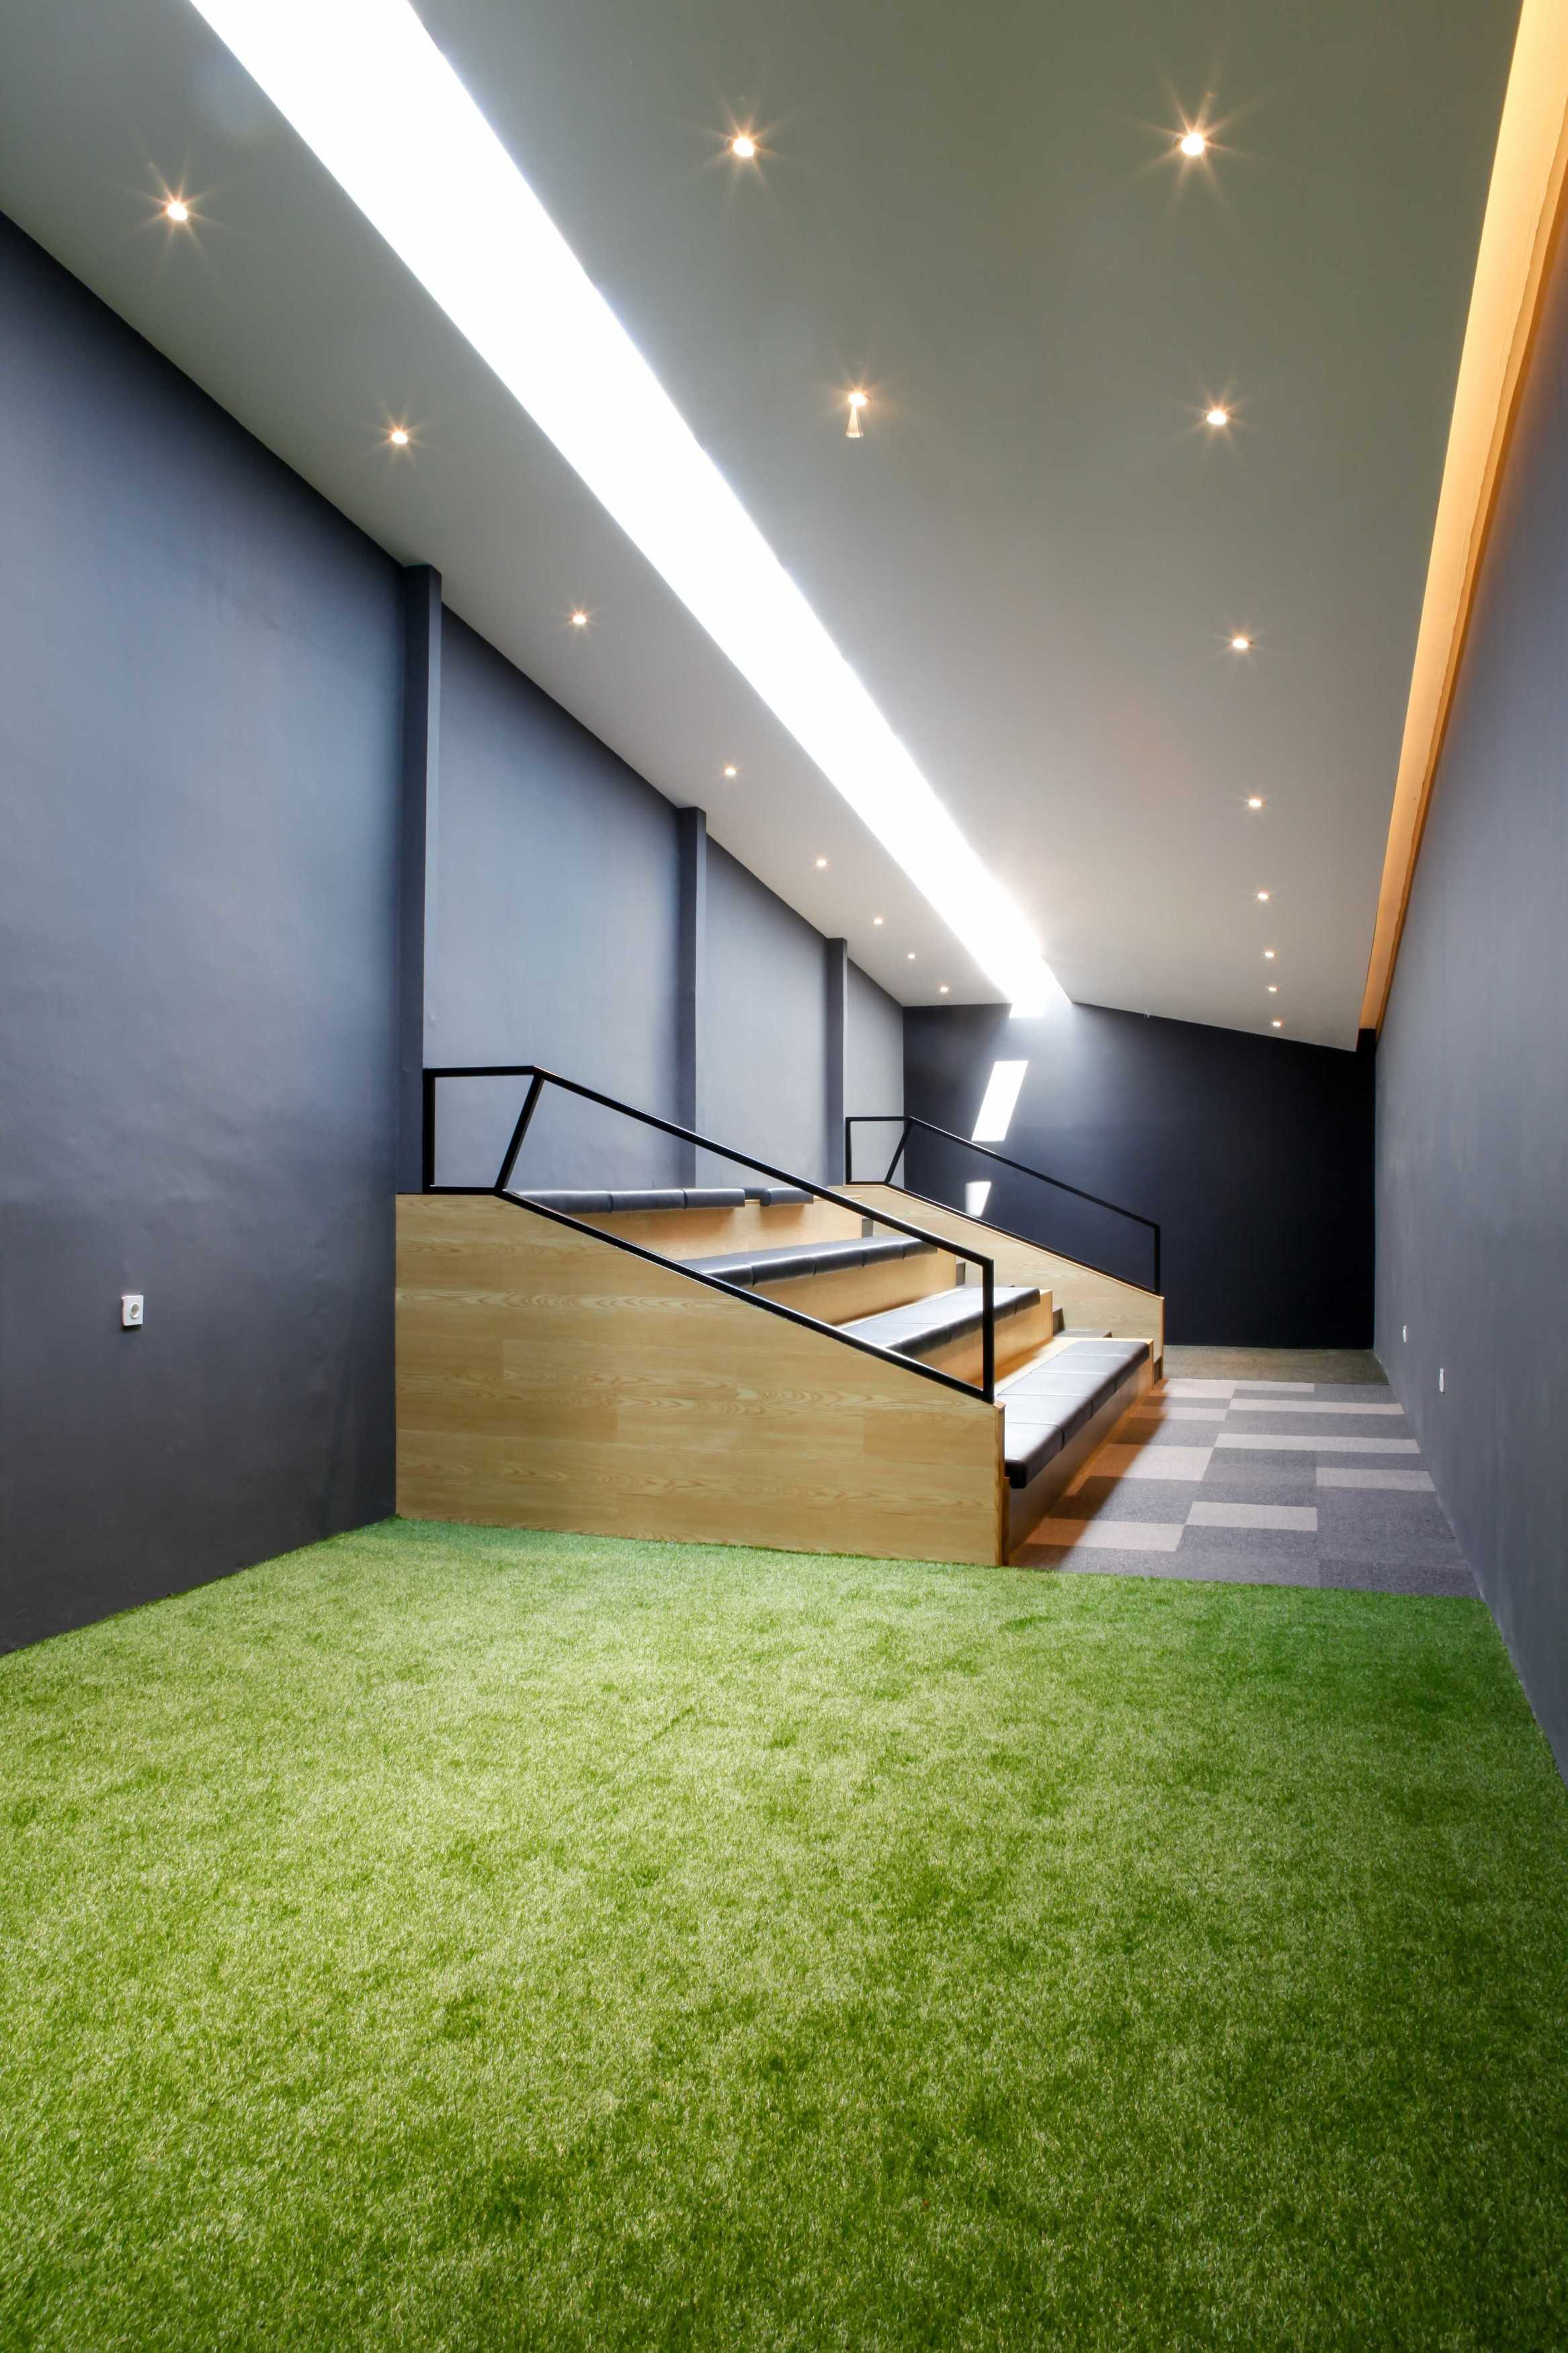 Design Intervention Simland Office Jakarta, Daerah Khusus Ibukota Jakarta, Indonesia Jakarta, Daerah Khusus Ibukota Jakarta, Indonesia Design-Intervention-Simland-Office   71059